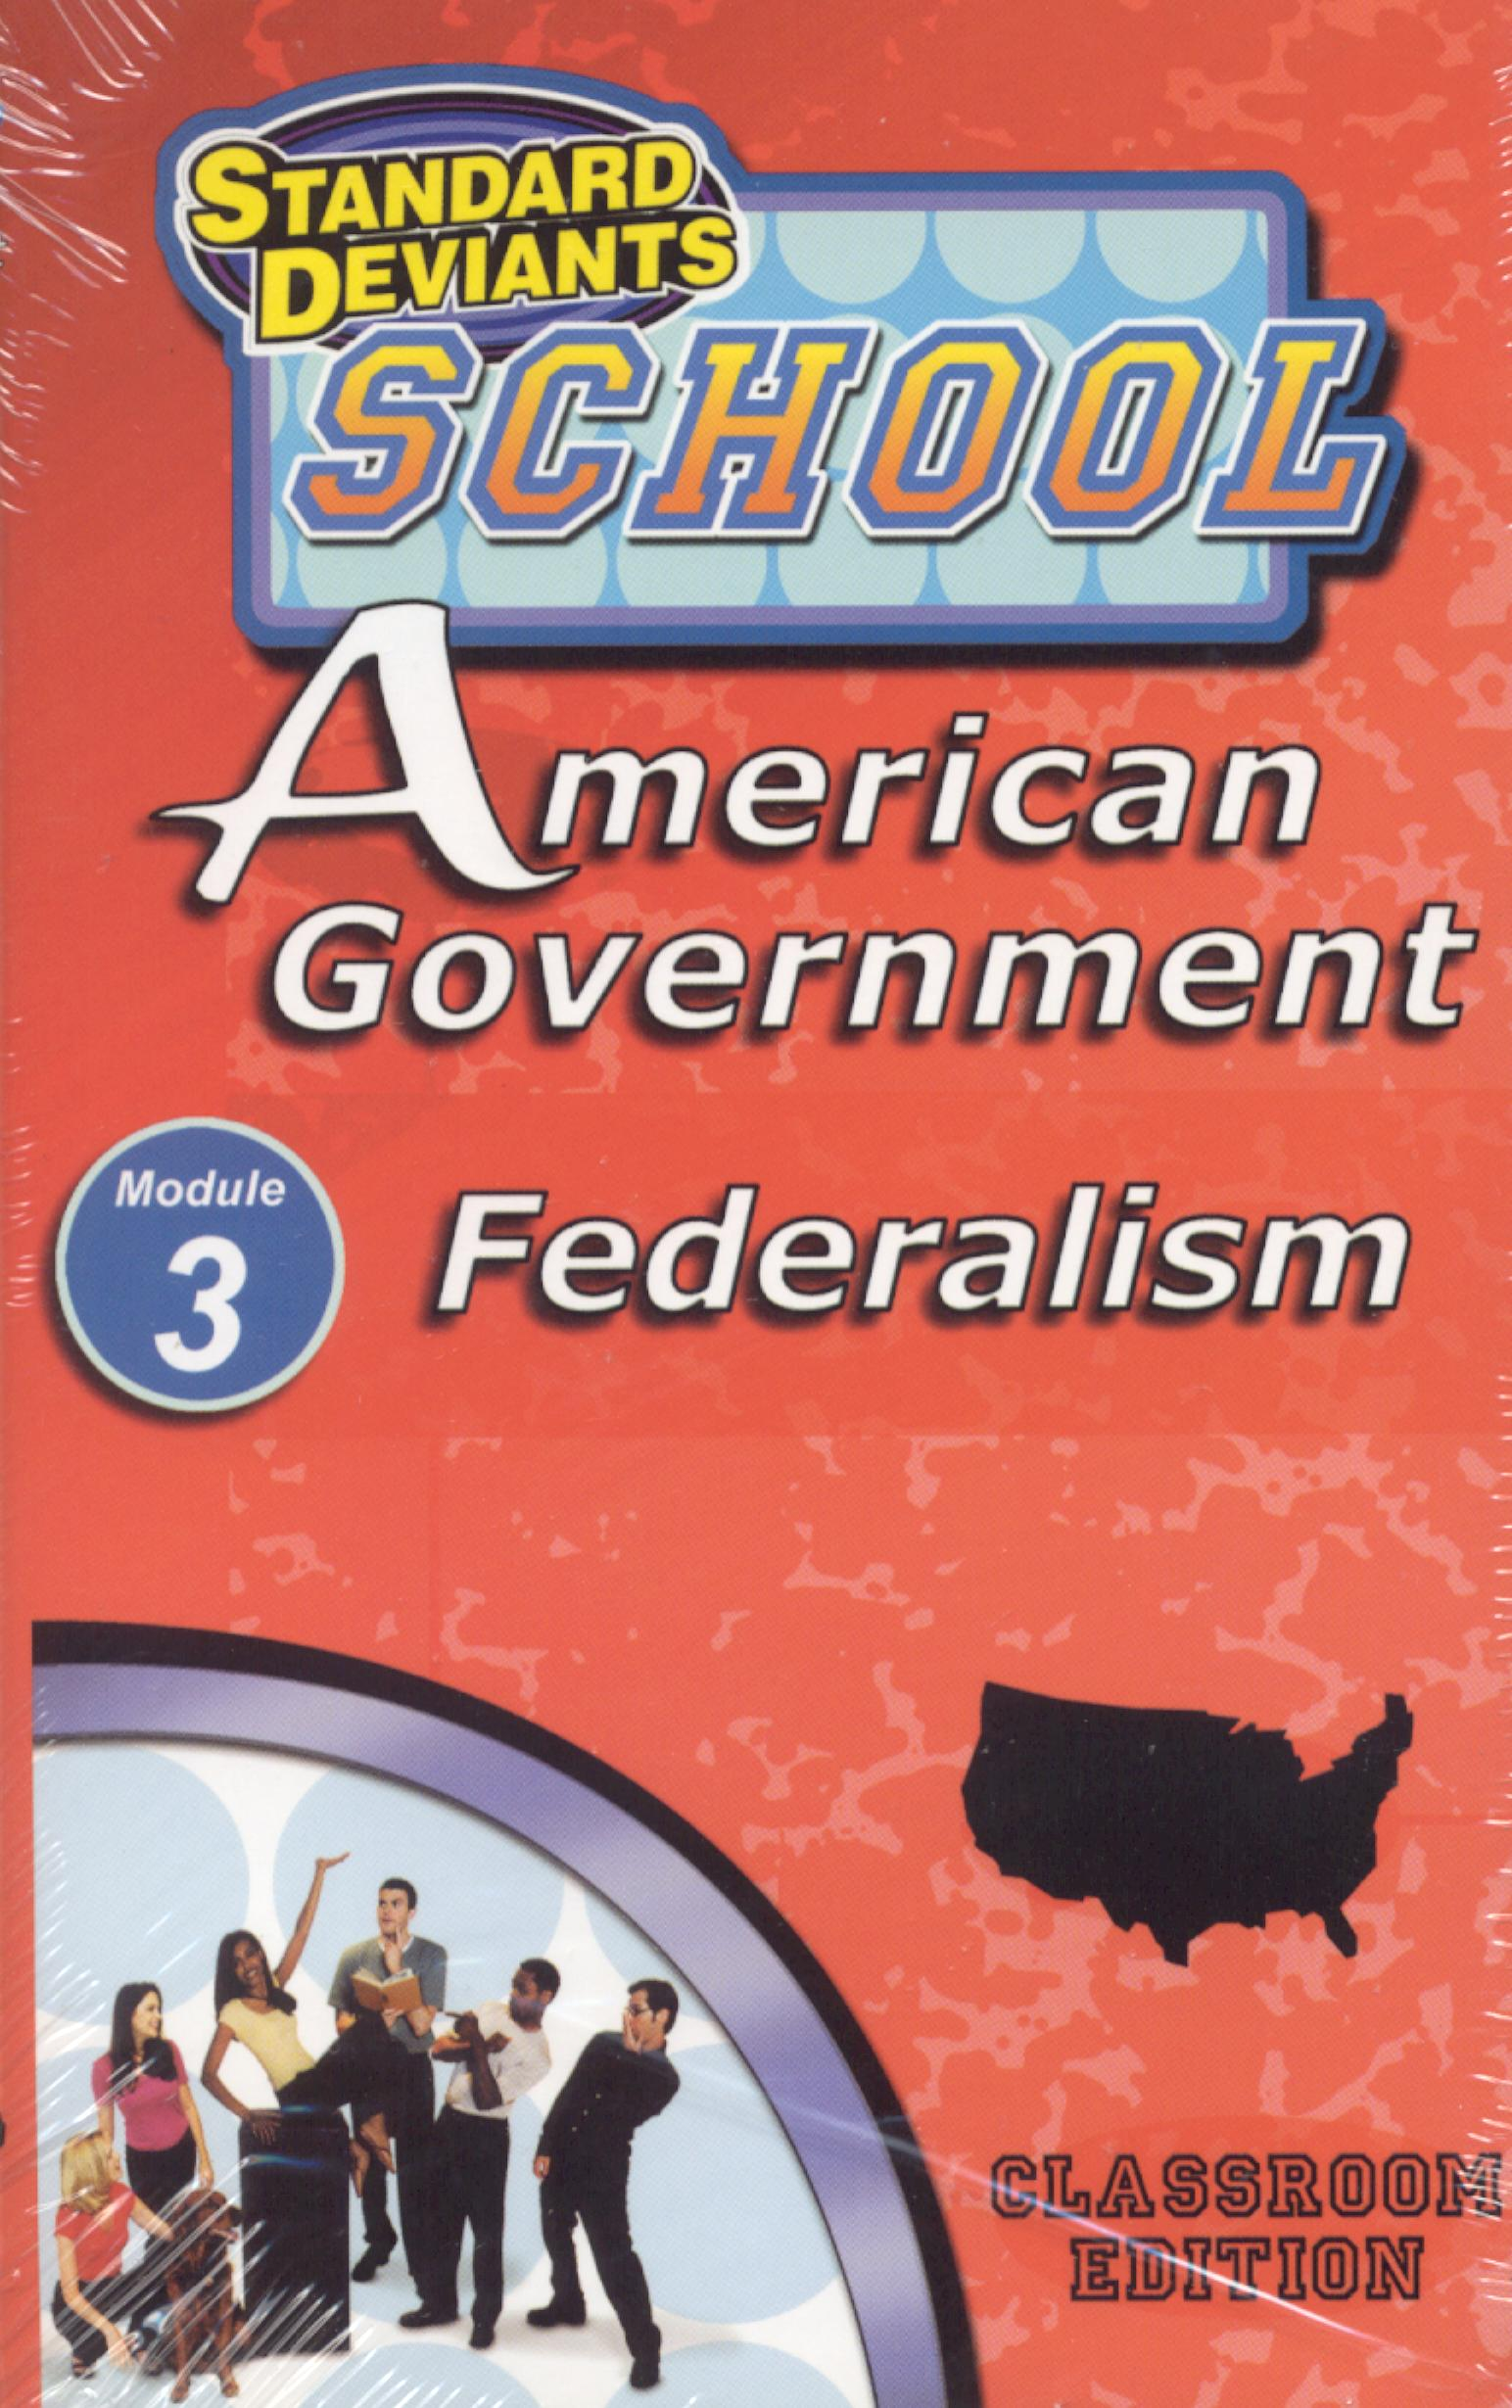 Standard Deviants School: American Government, Module 3 - Federalism